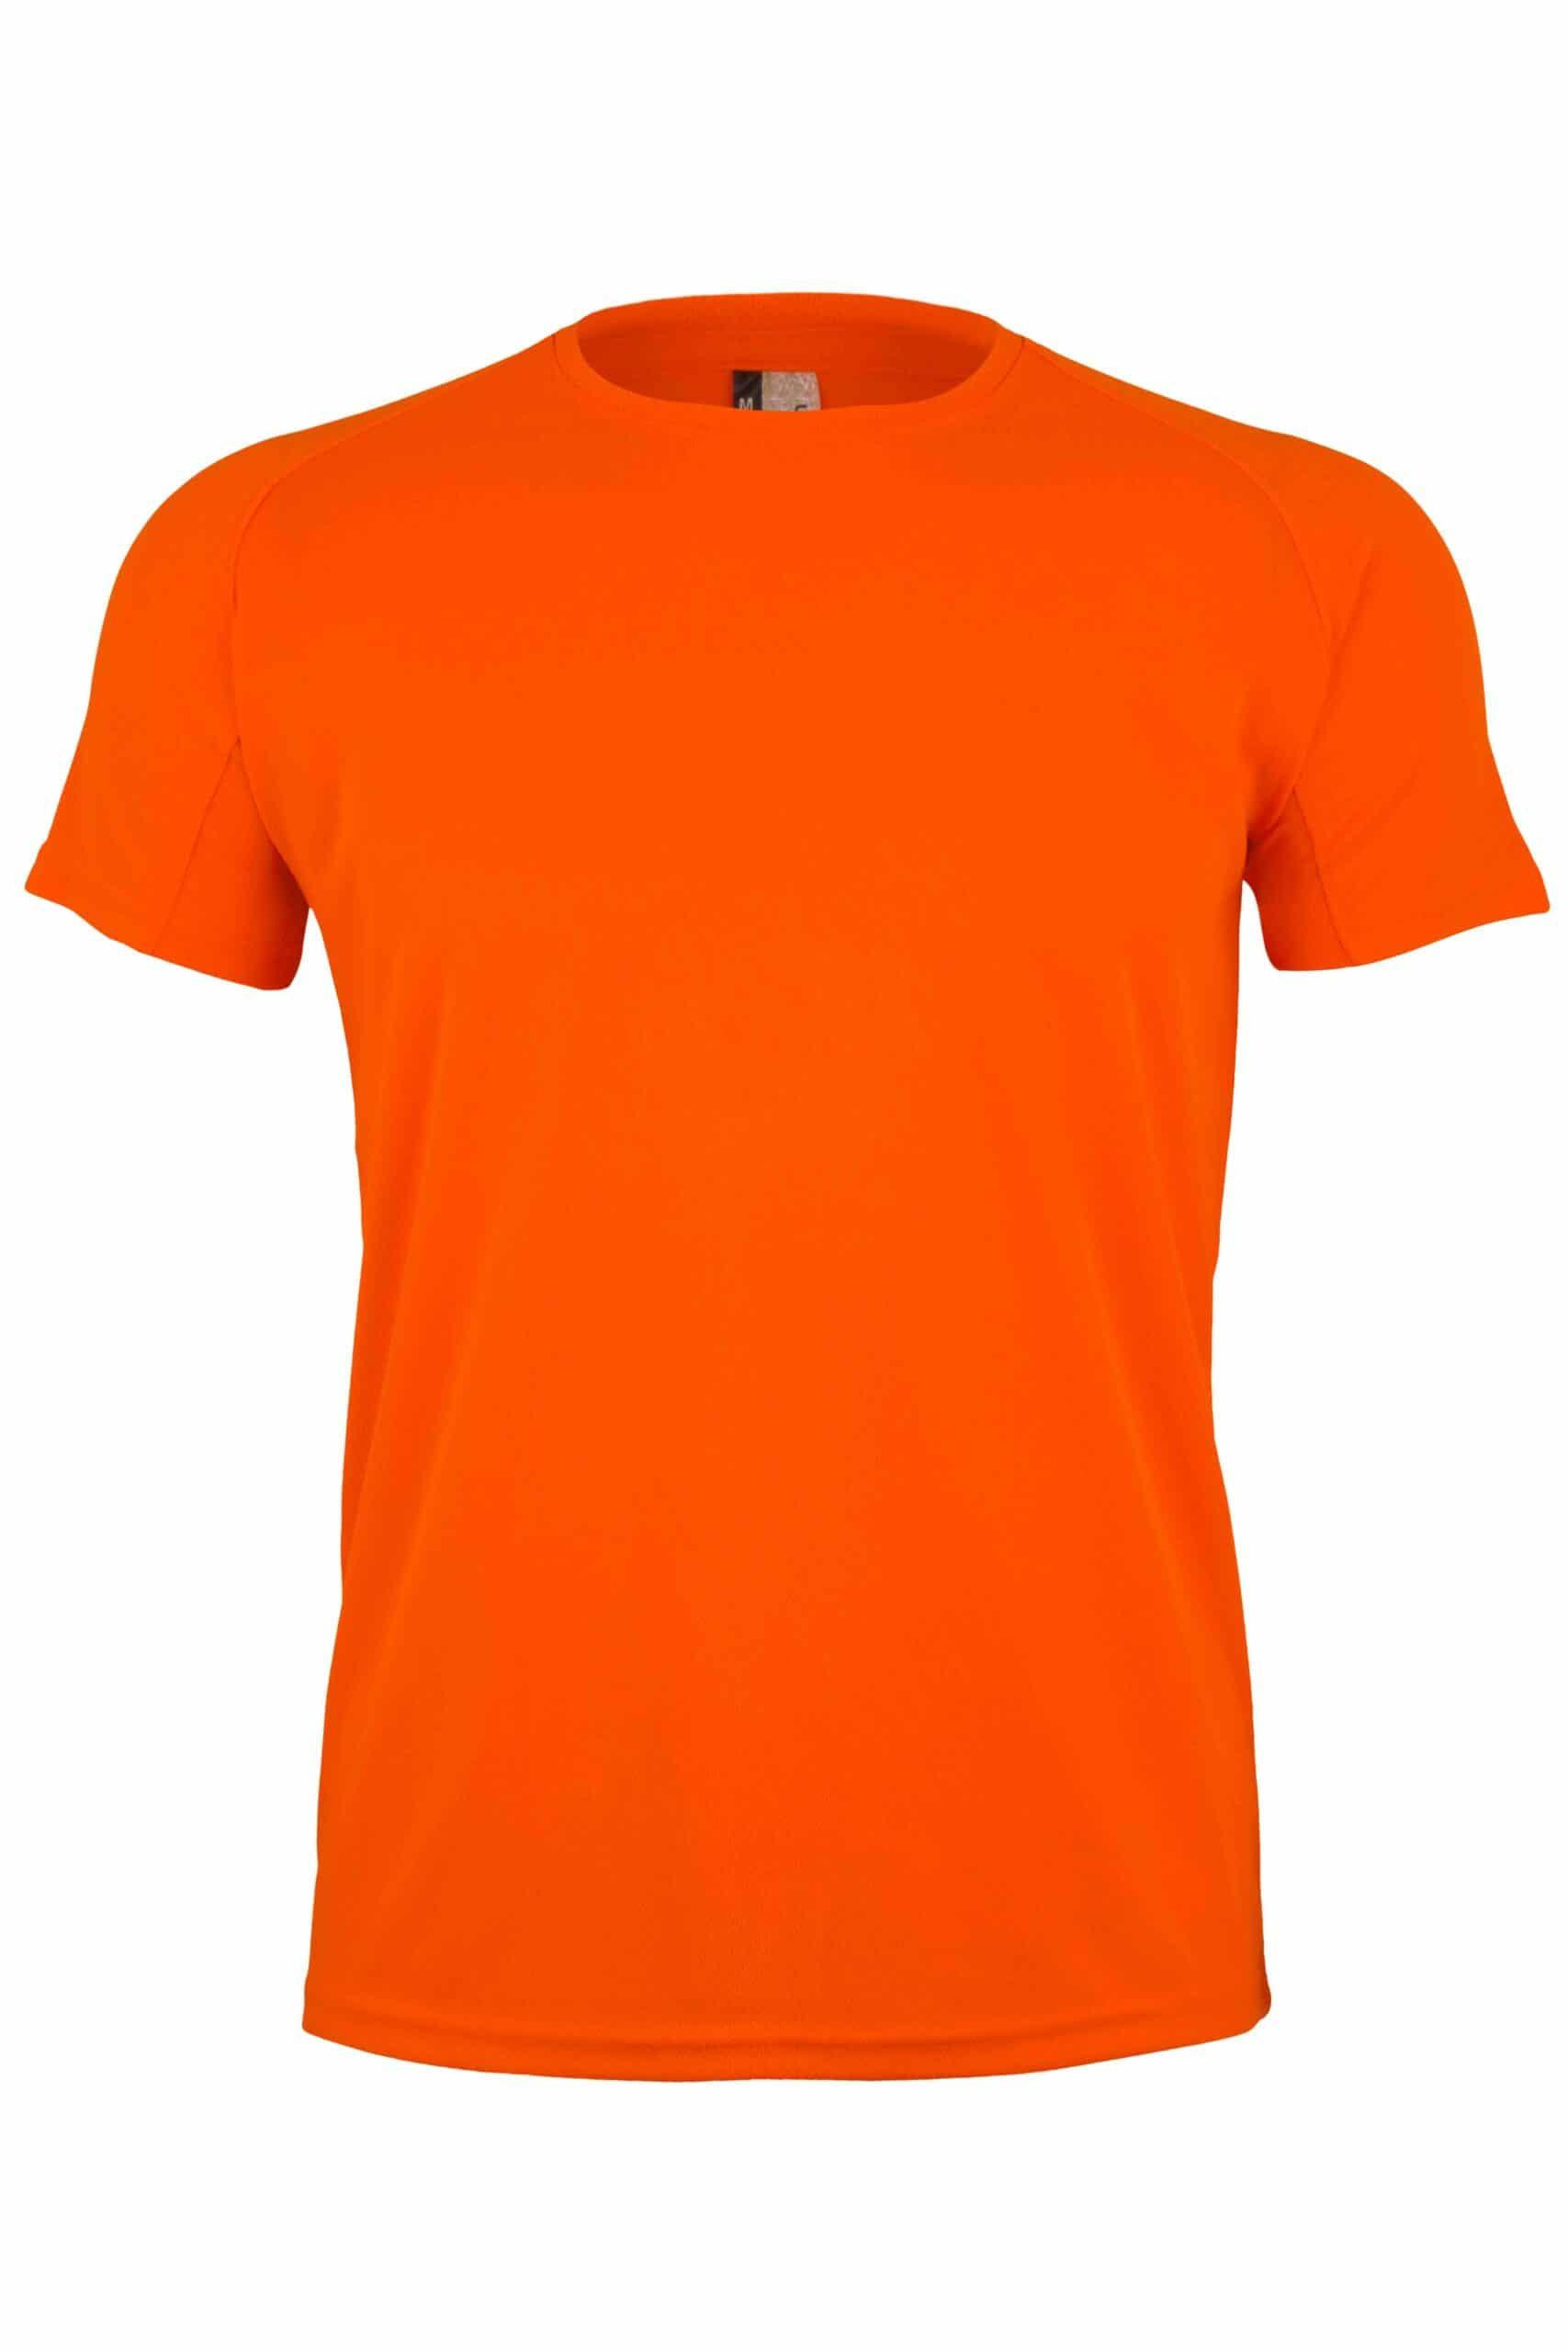 Mukua Mk521v Camiseta TÉcnica Manga Corta NiÑo Orange